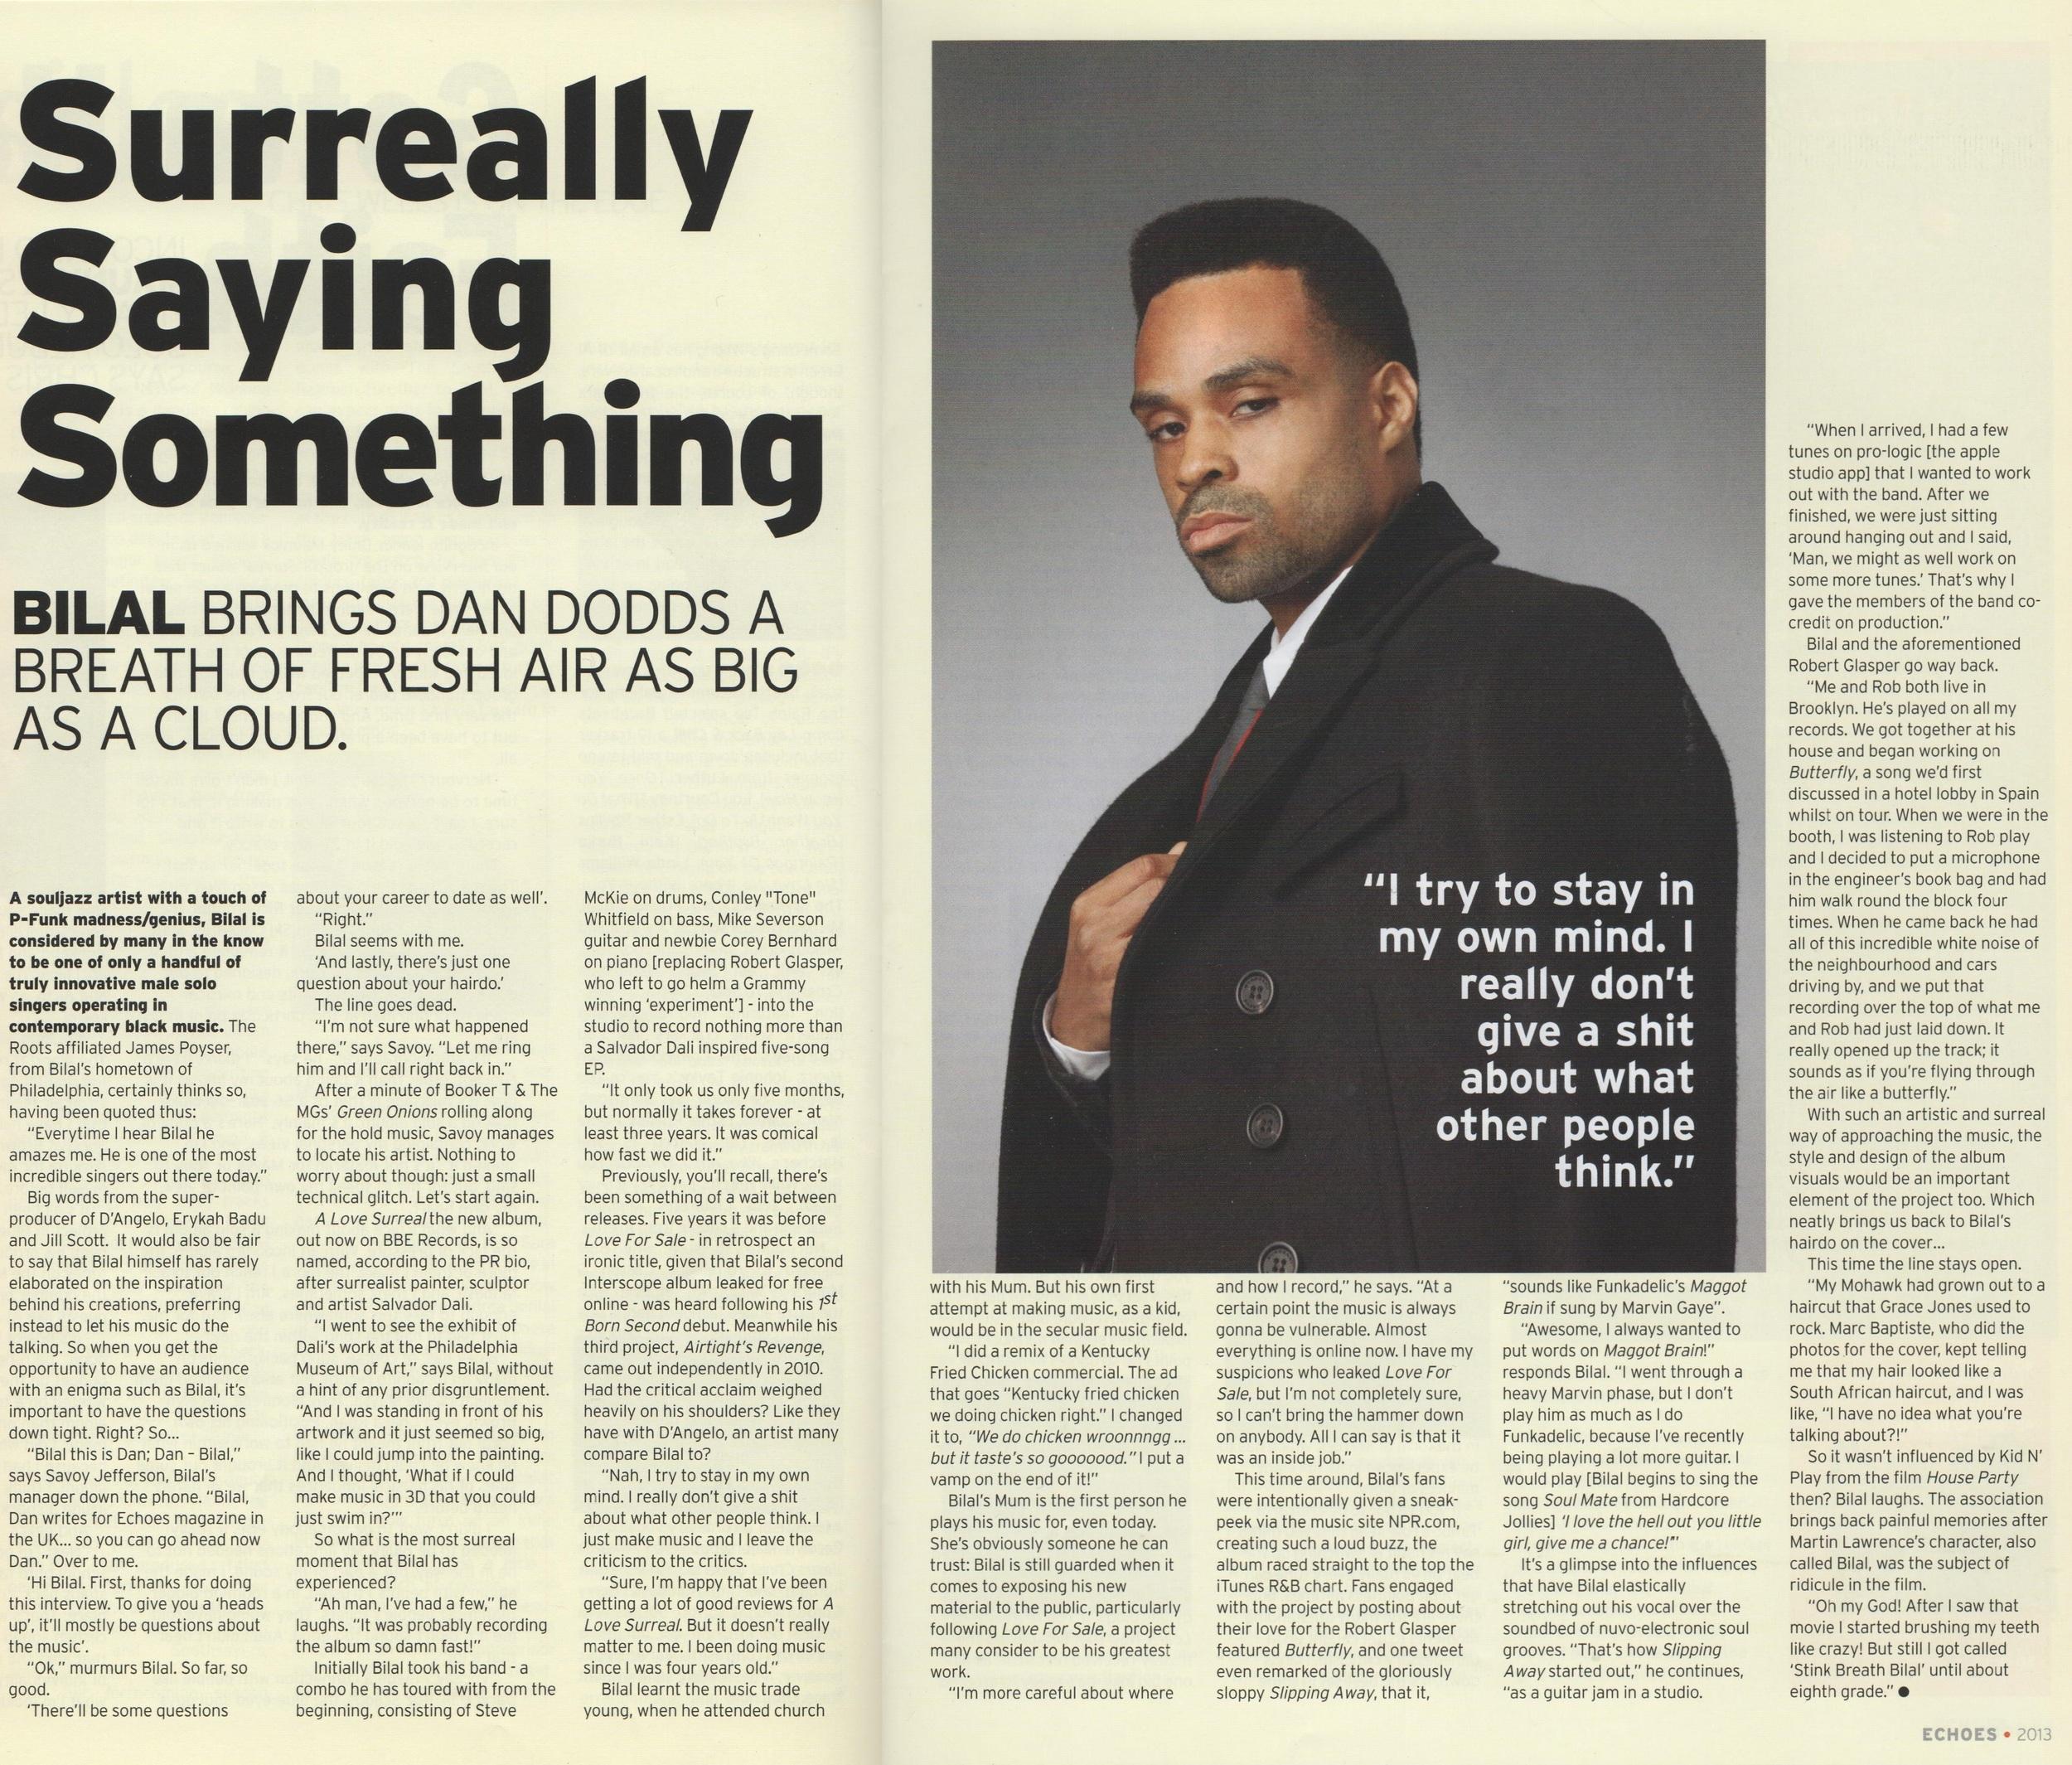 Echoes Magazine Apr 2013